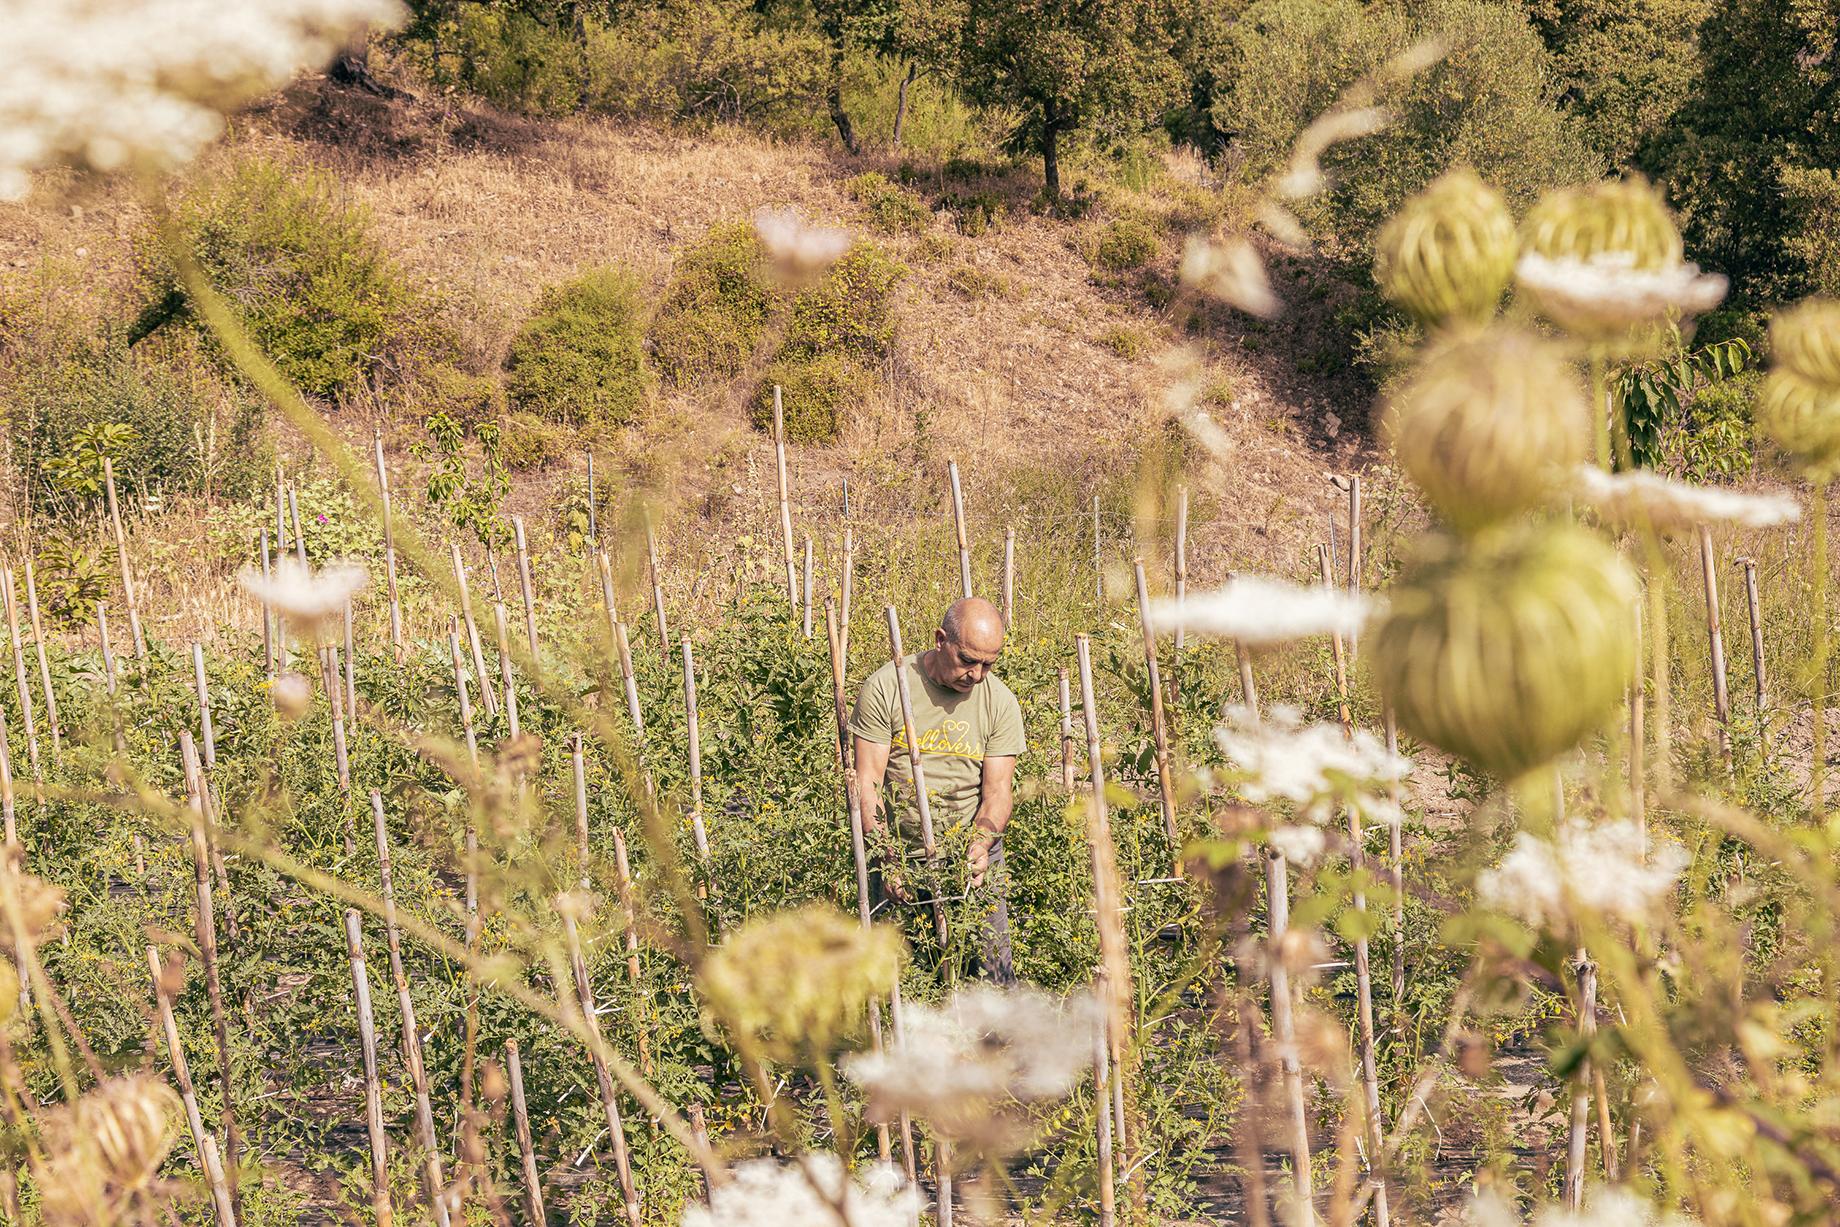 Lollovers inn vegetable garden, Pietro Tolu at work shot by Alberto Bernasconi for Enjoy magazine